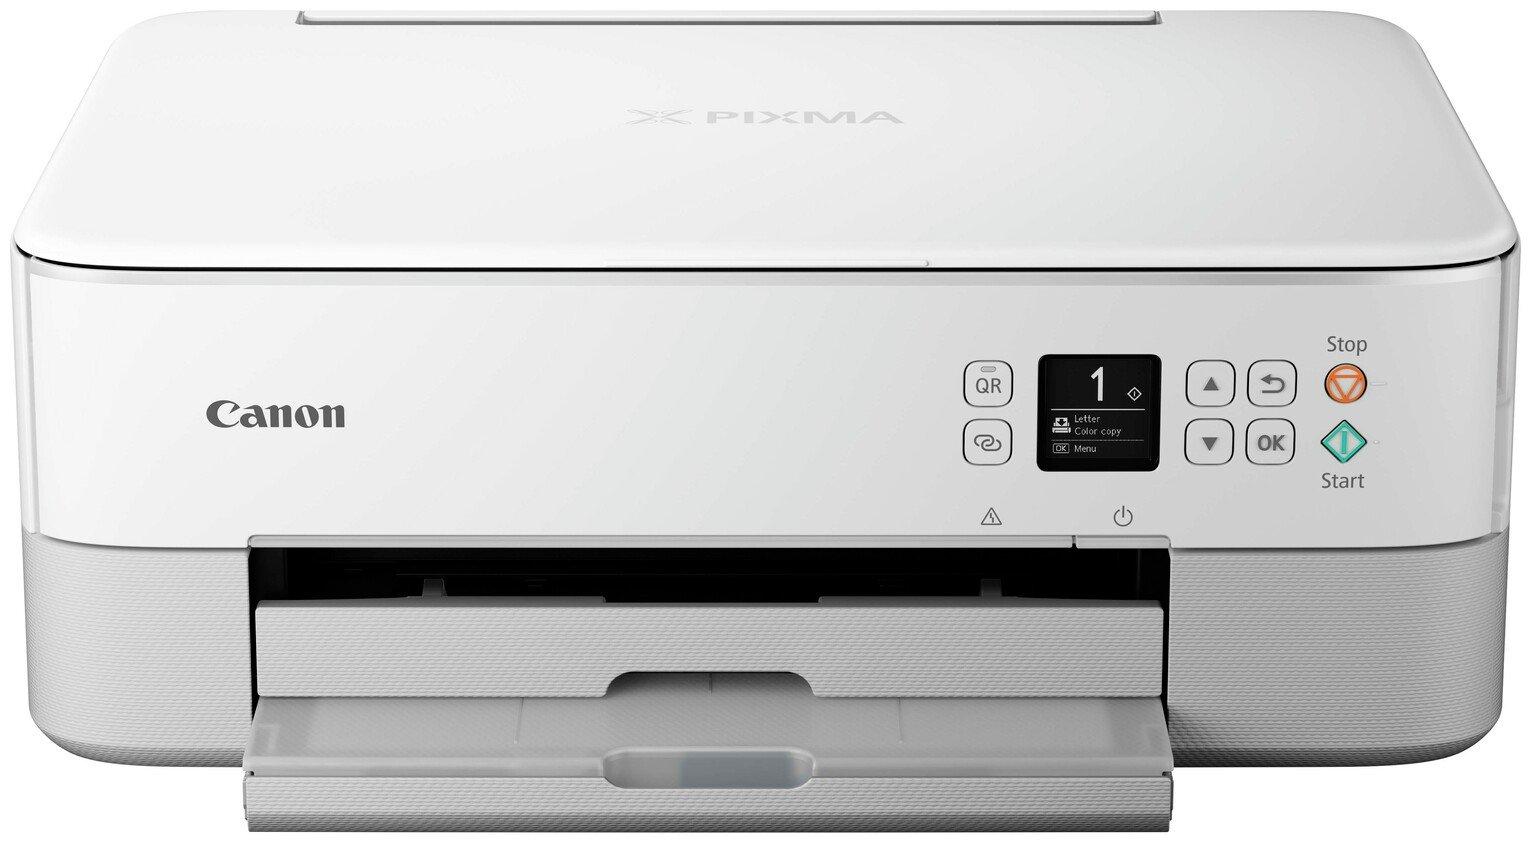 Canon PIXMA TS5351 Wireless Inkjet Printer